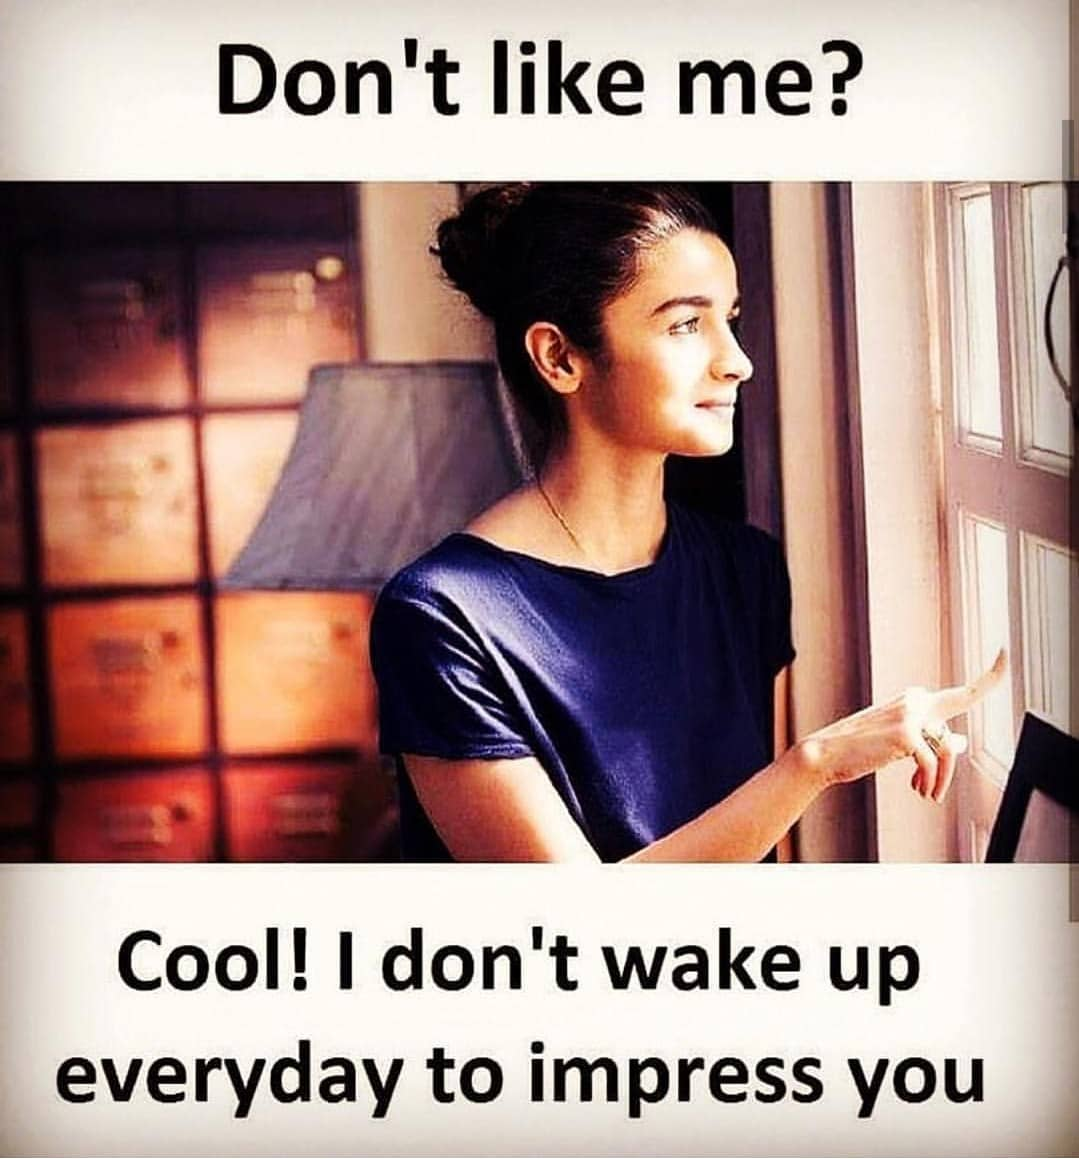 www-funny-memes-in-hindi-com-52-Dubal2-BMining2-BMemes2-B2528142529